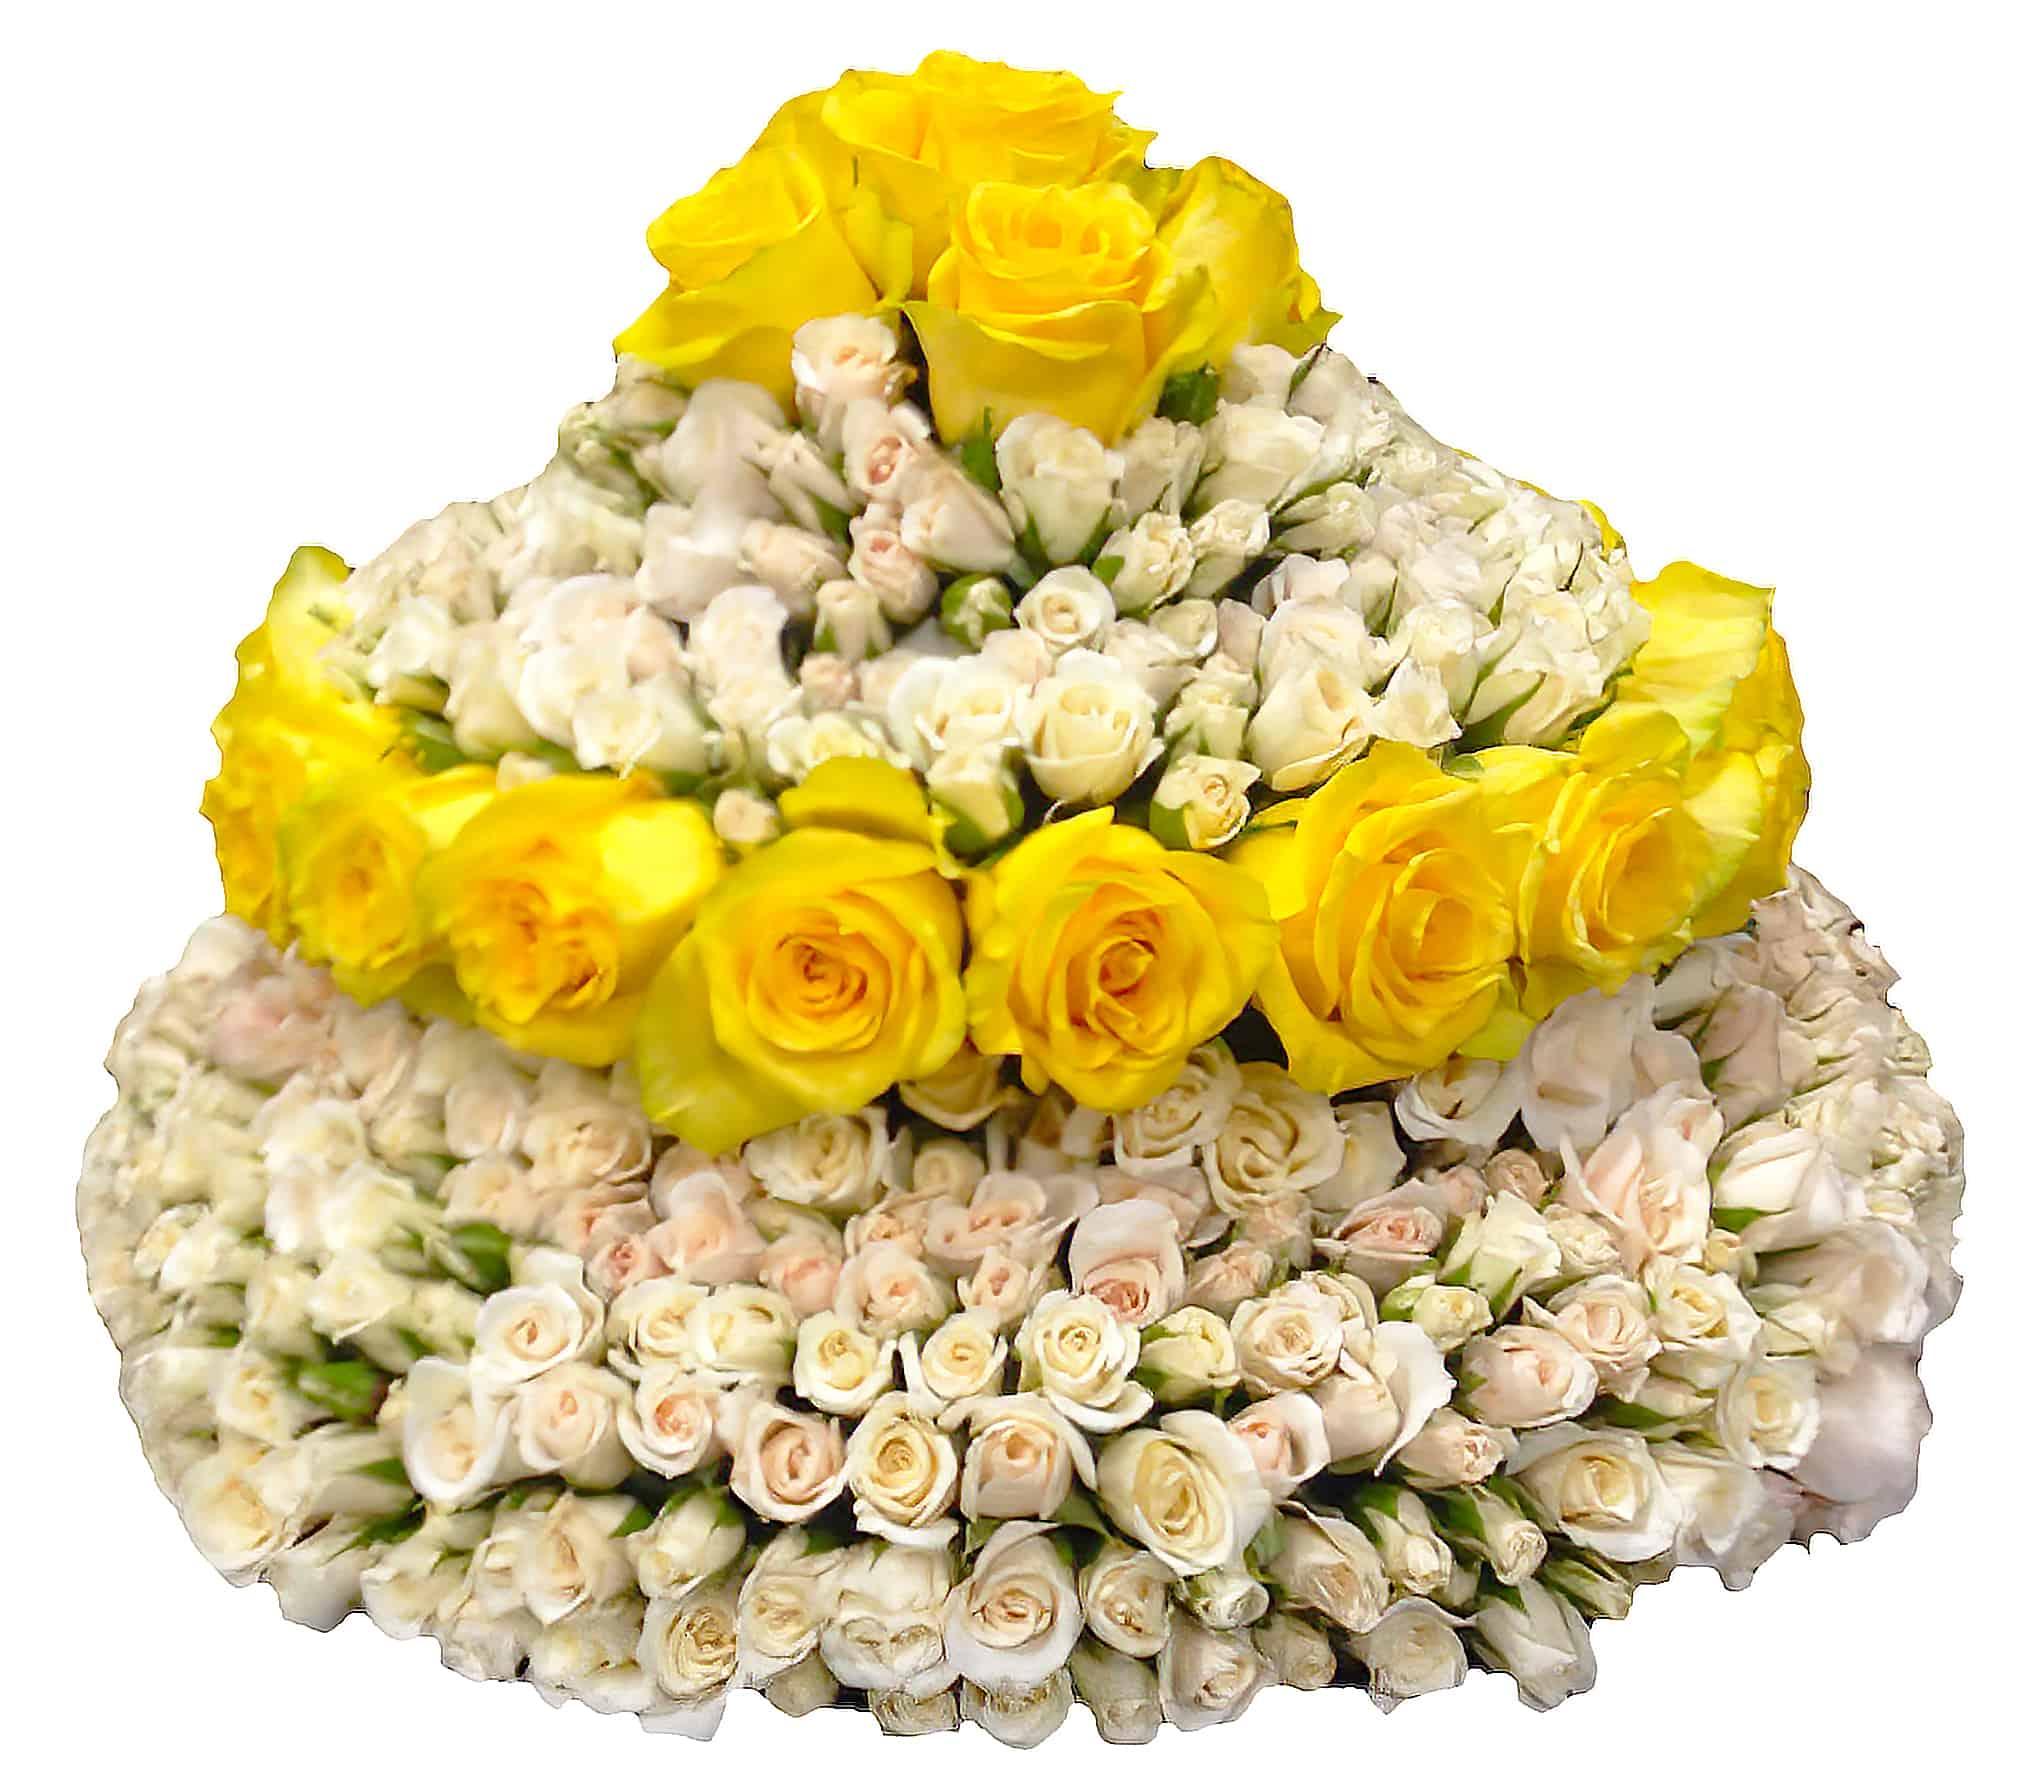 Large Cake of Roses Flower Arrangement